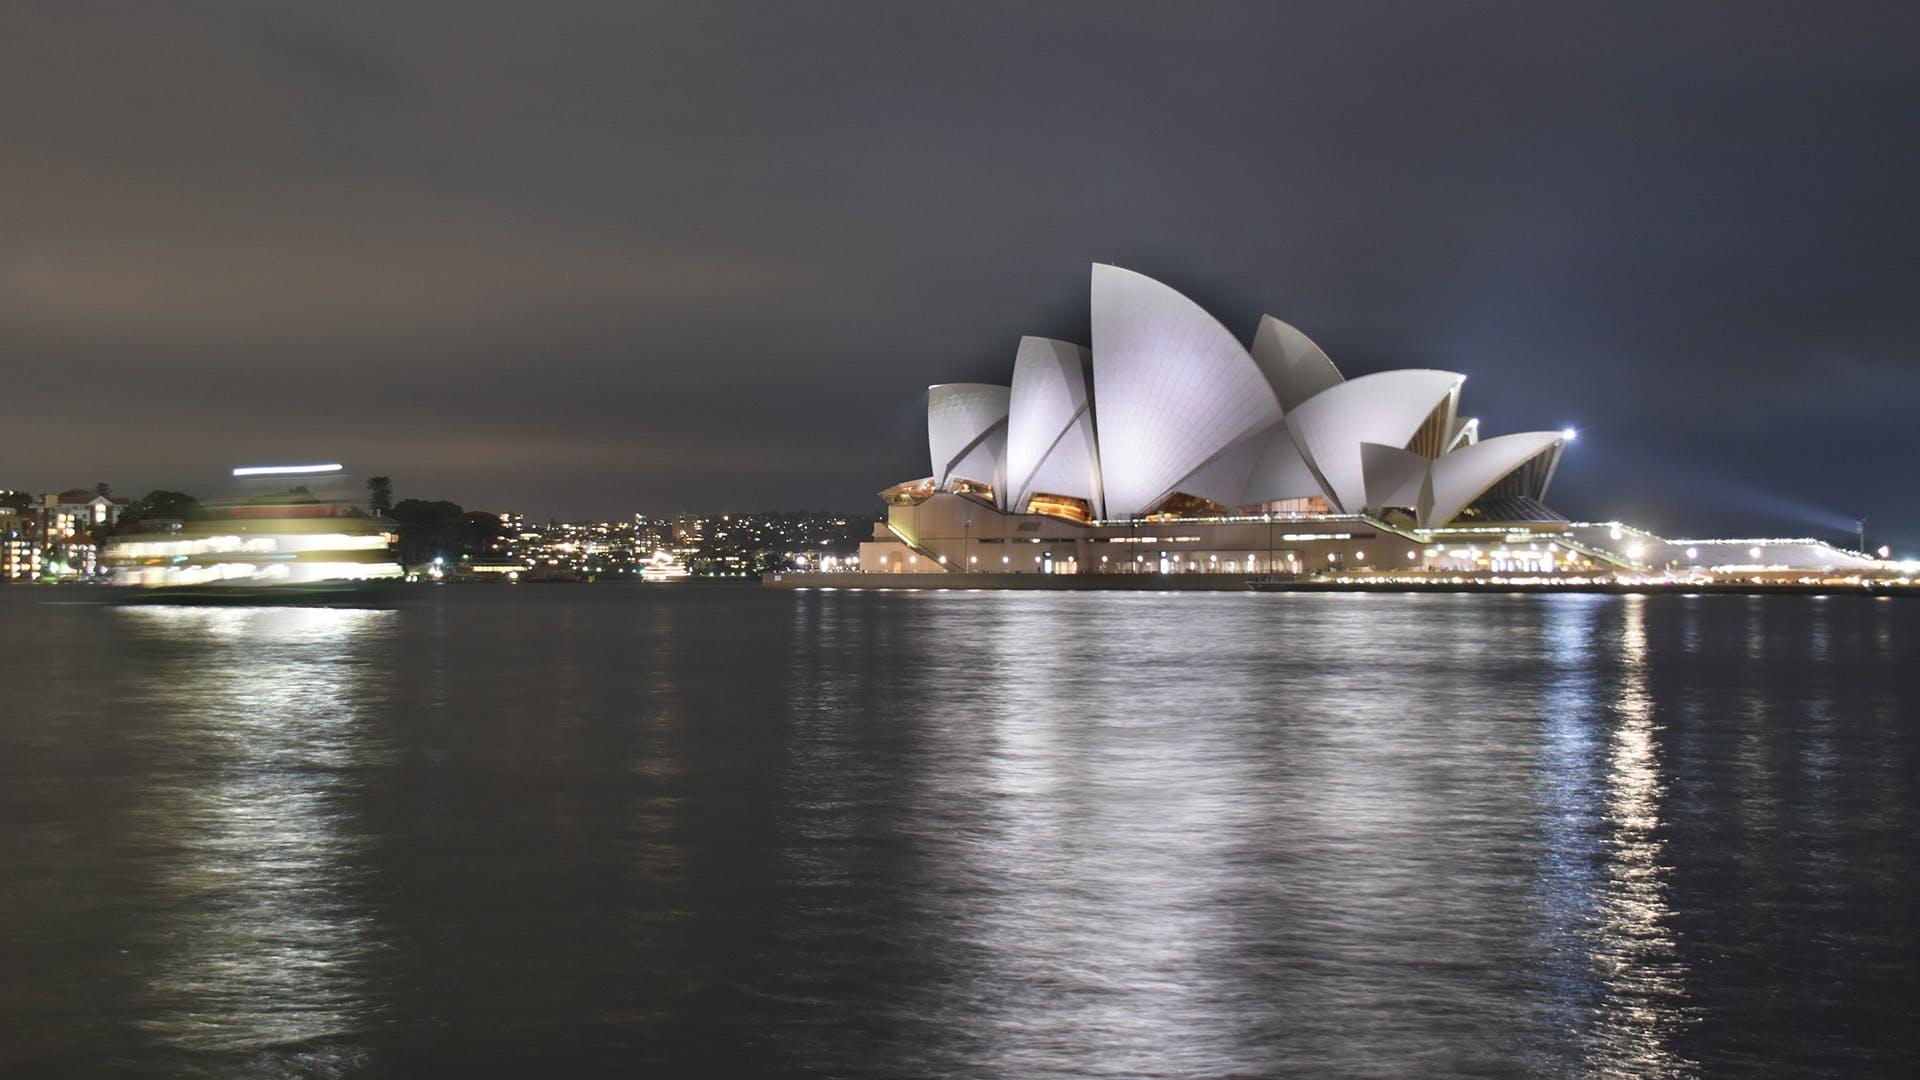 Free stock photo of sydney opera house